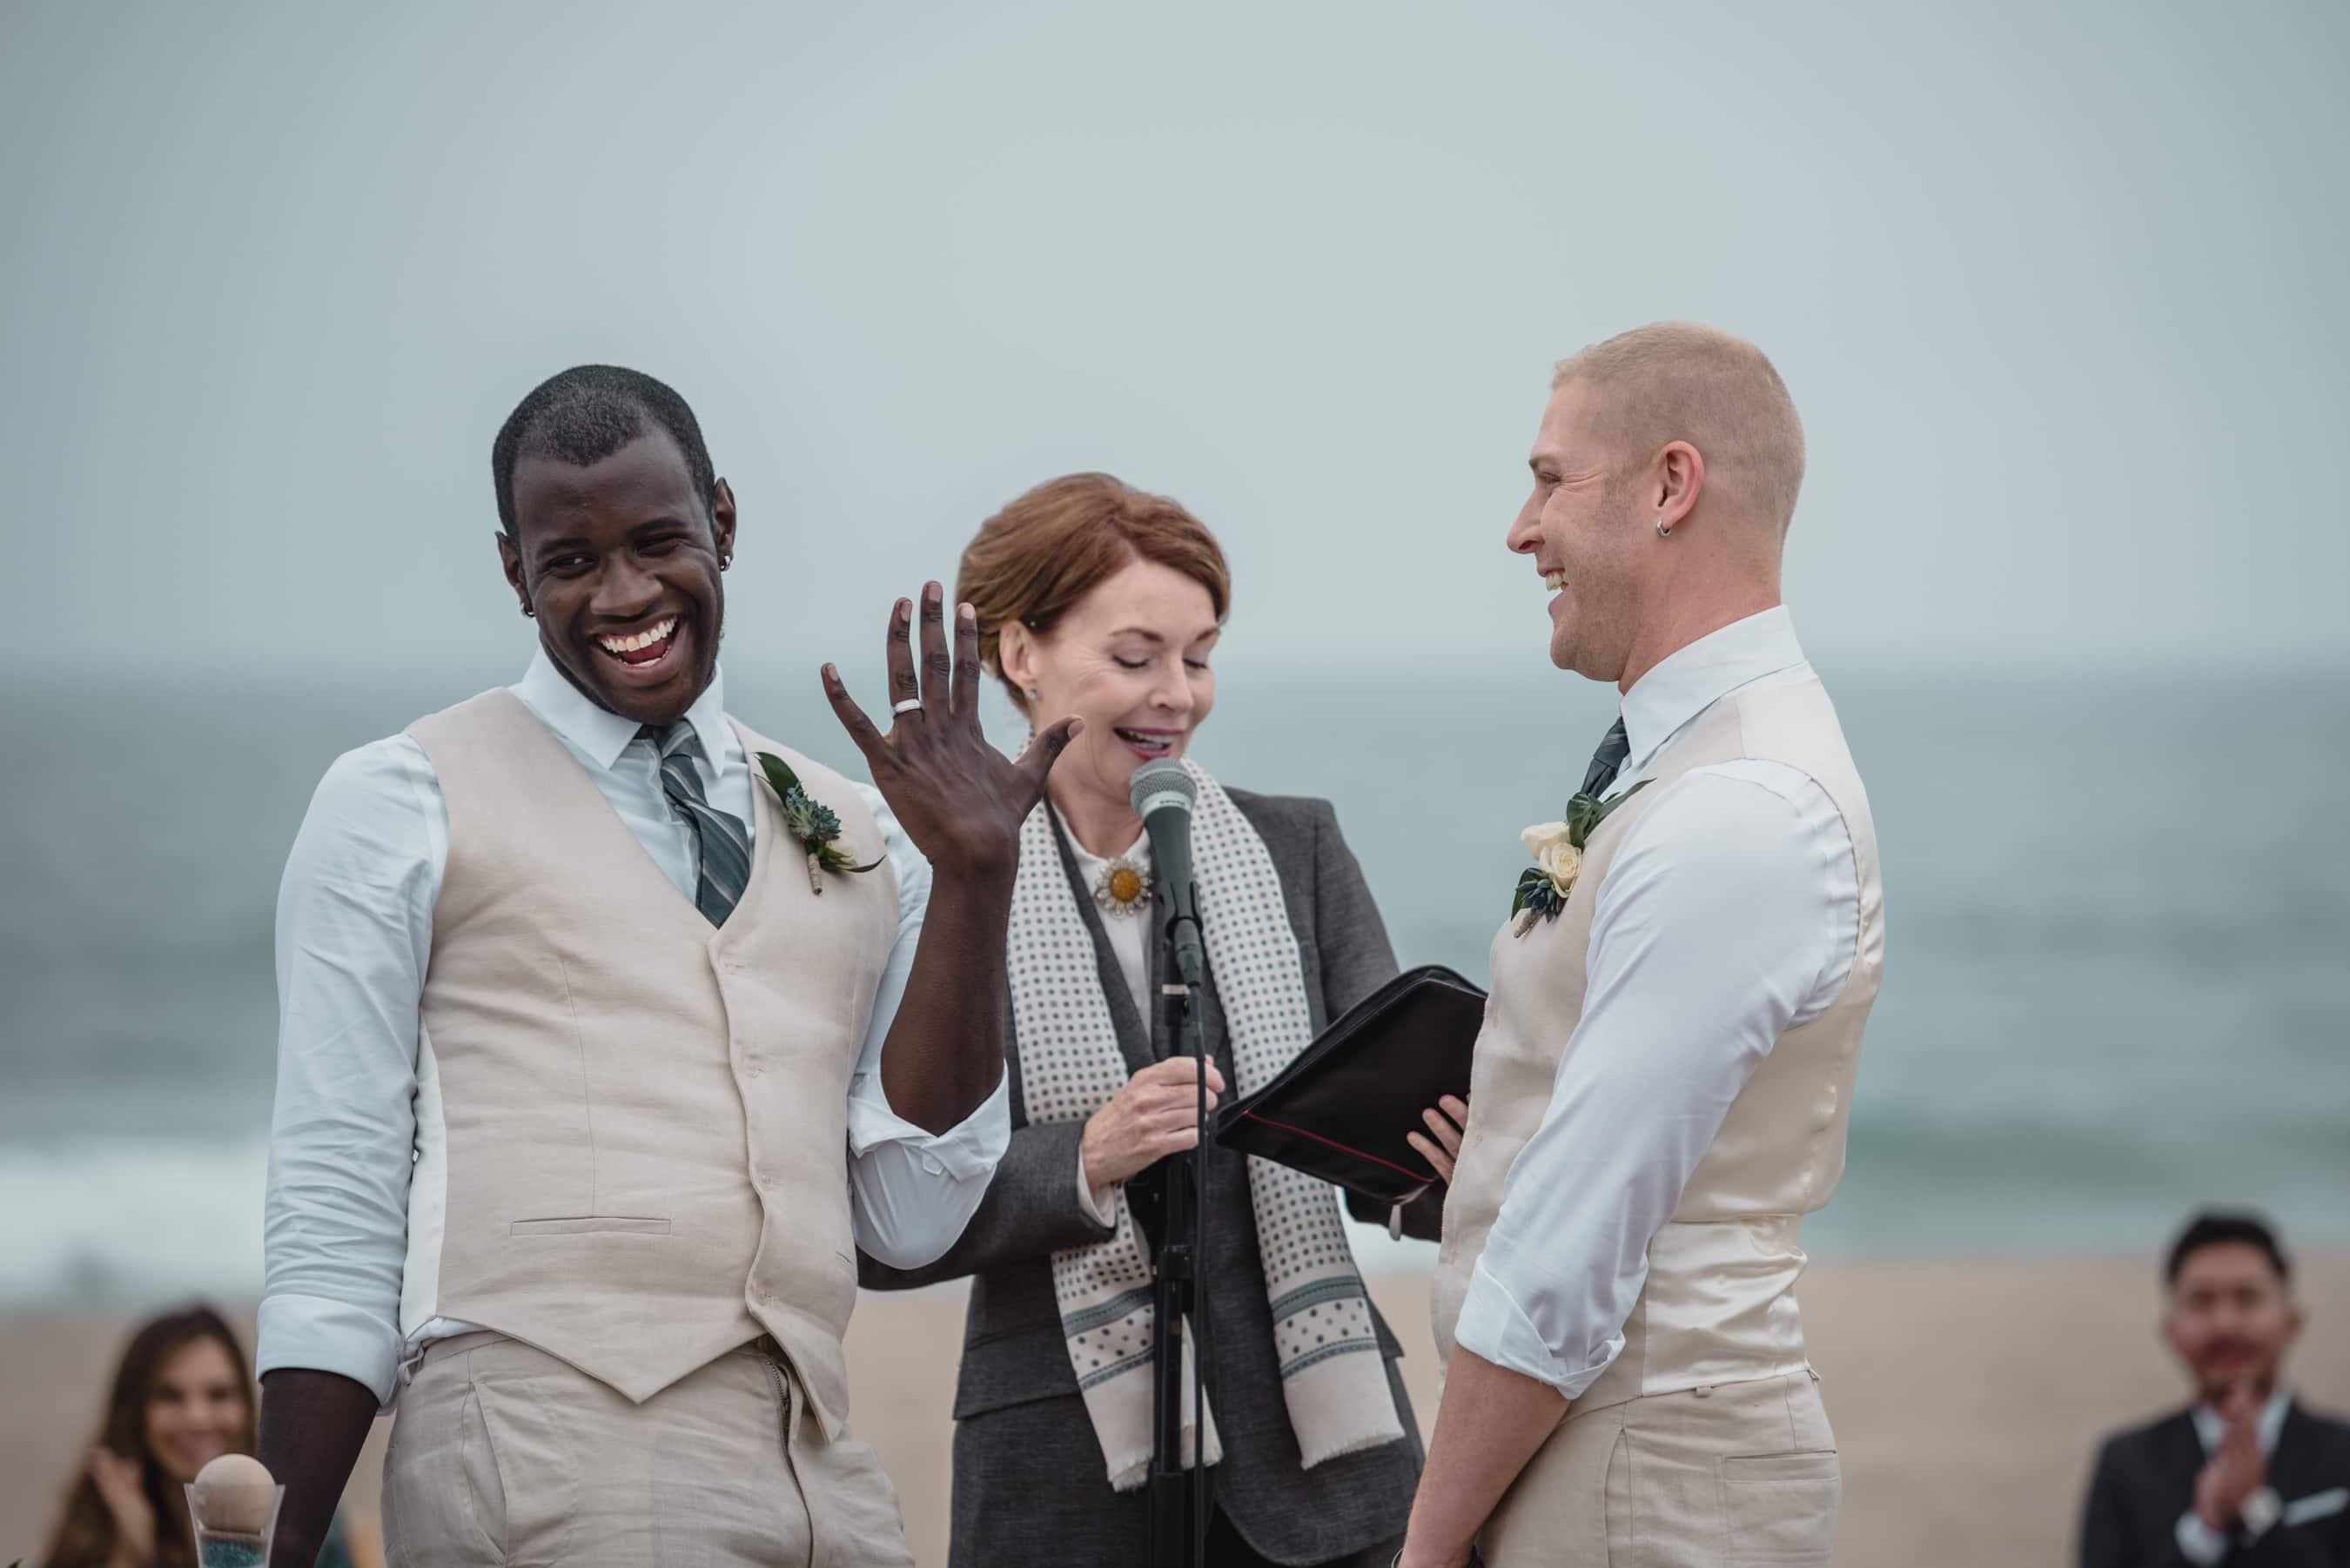 gay wedding ceremony in Manhatan Beach.jpg